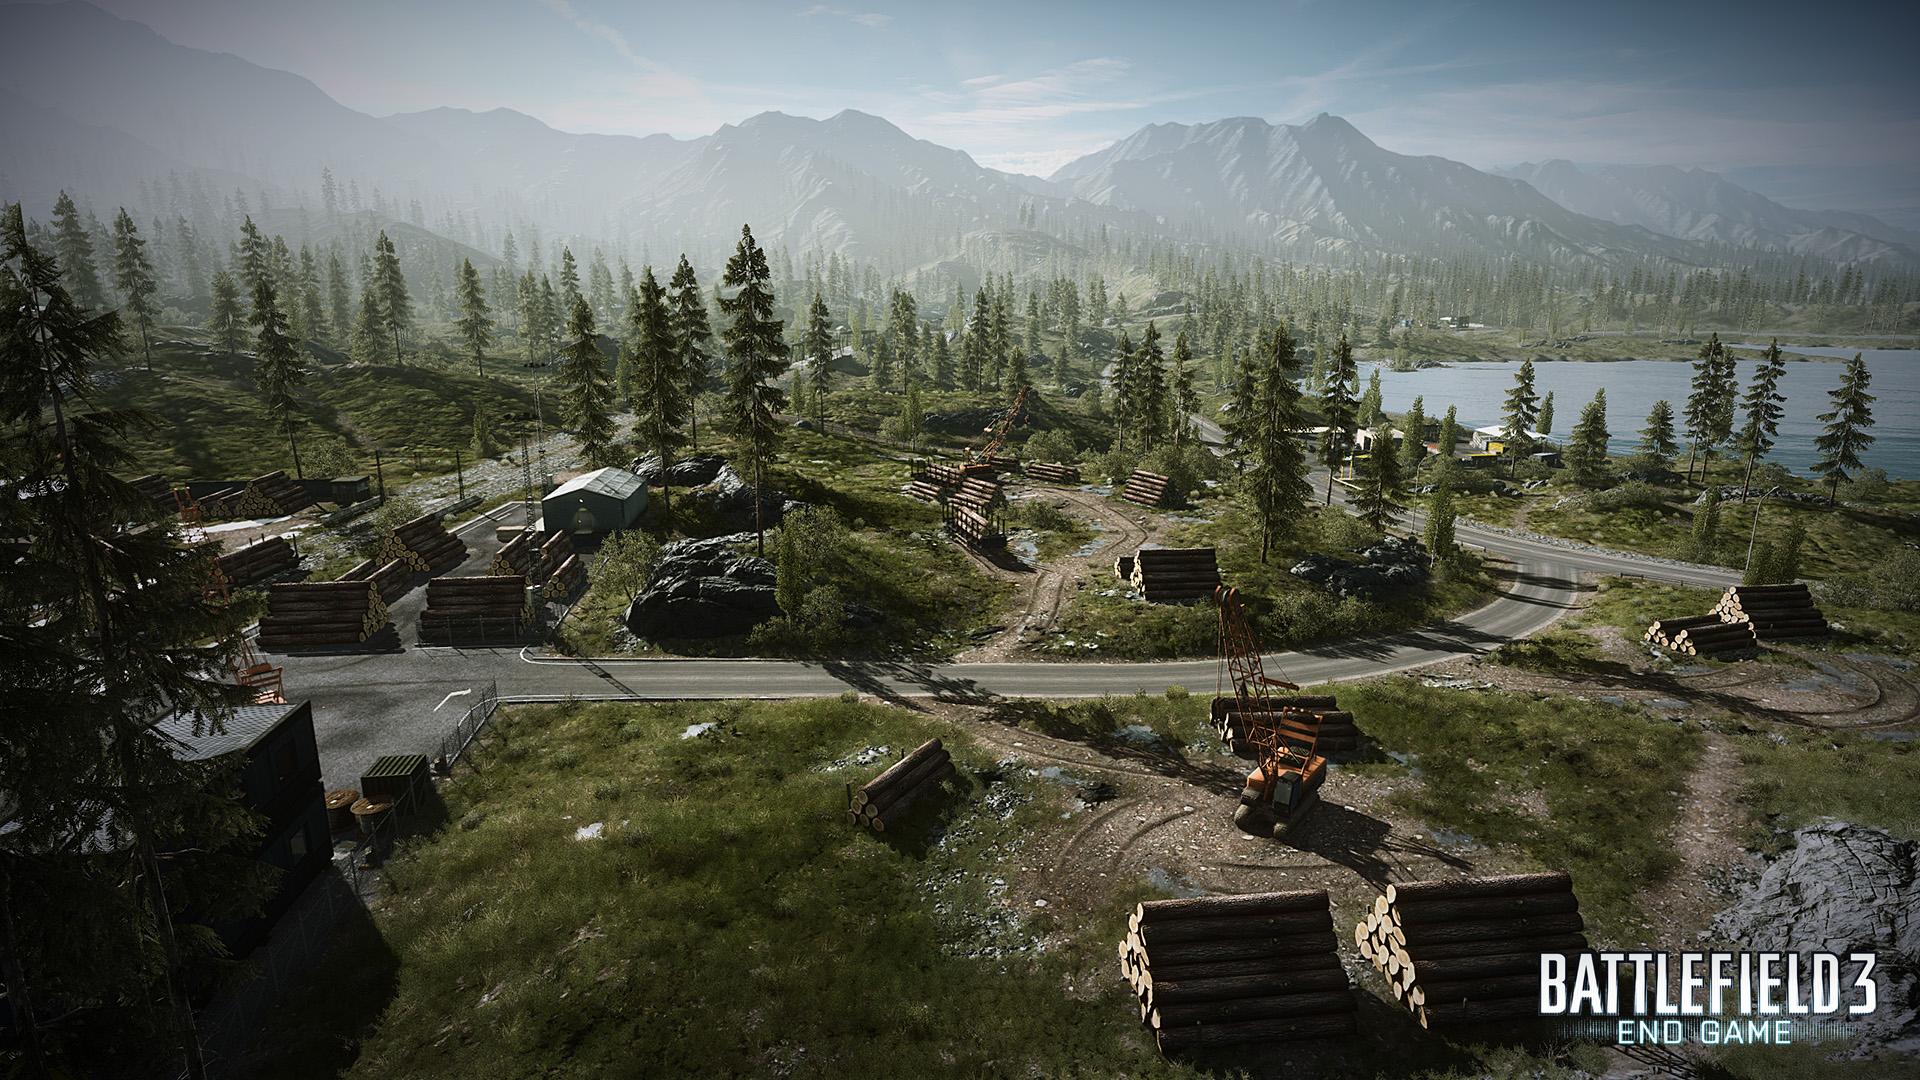 Battlefield 3: Neue Map aus dem Battlefield 3 DLC End Game